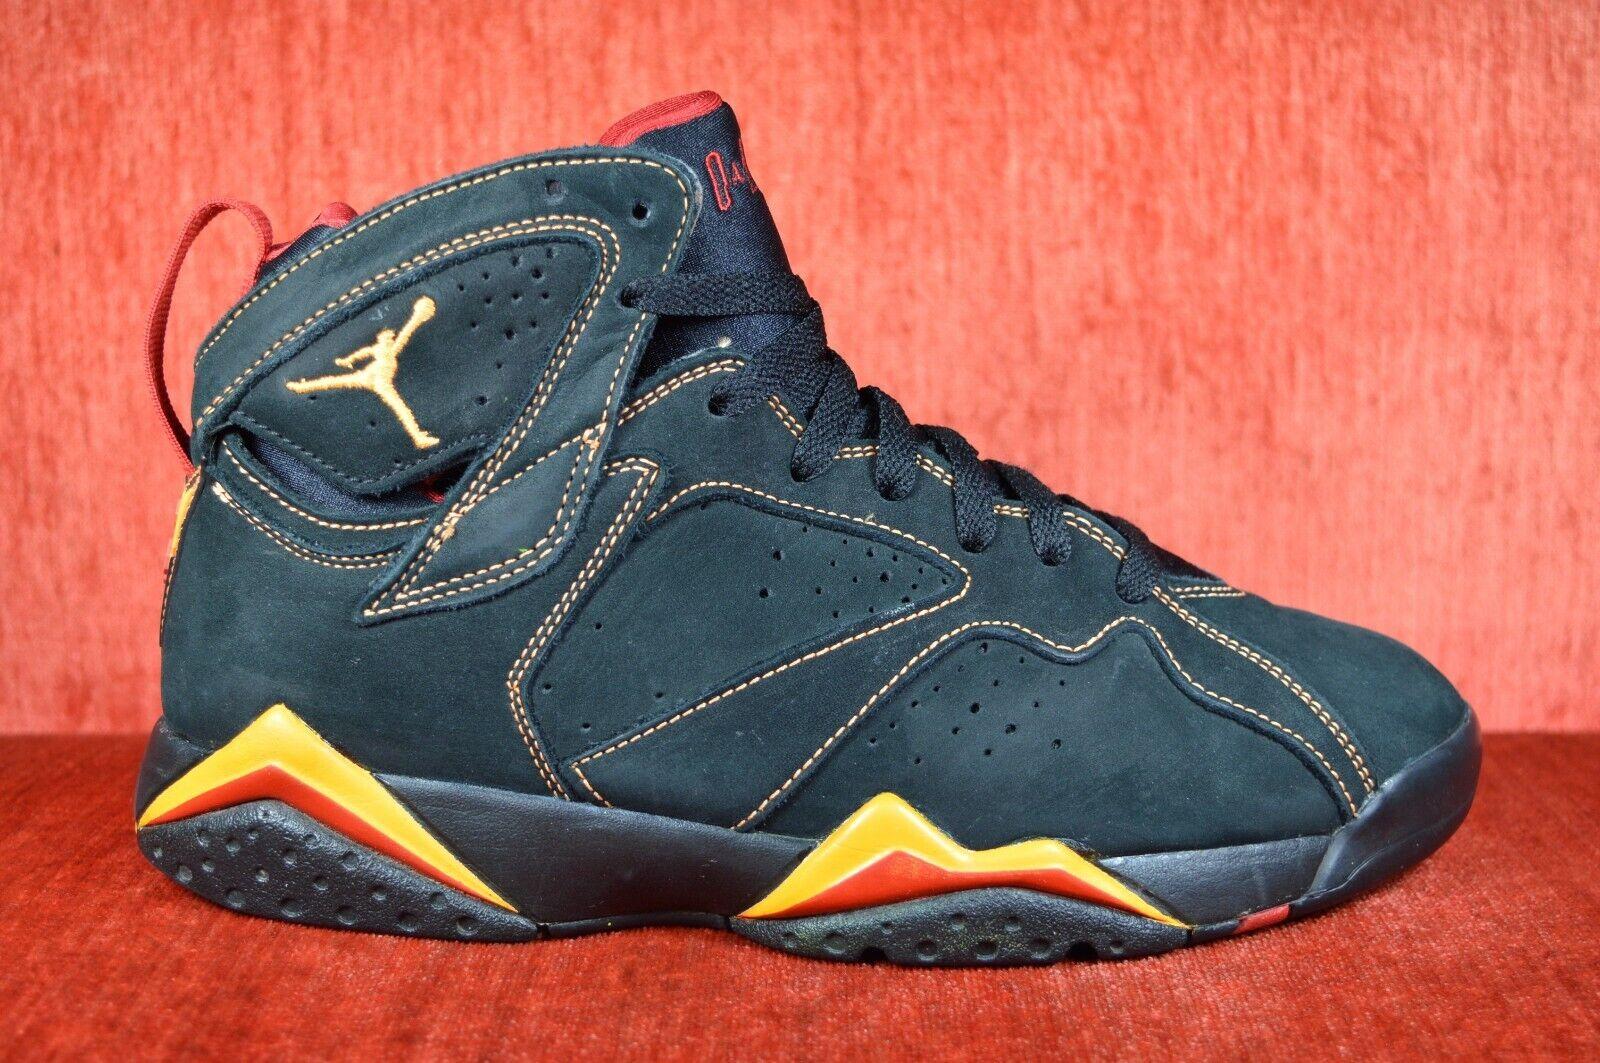 "CLEAN 2006 Air Jordan VII 7  Citrus"" Size 8 BLACK SUEDE 304775 081"